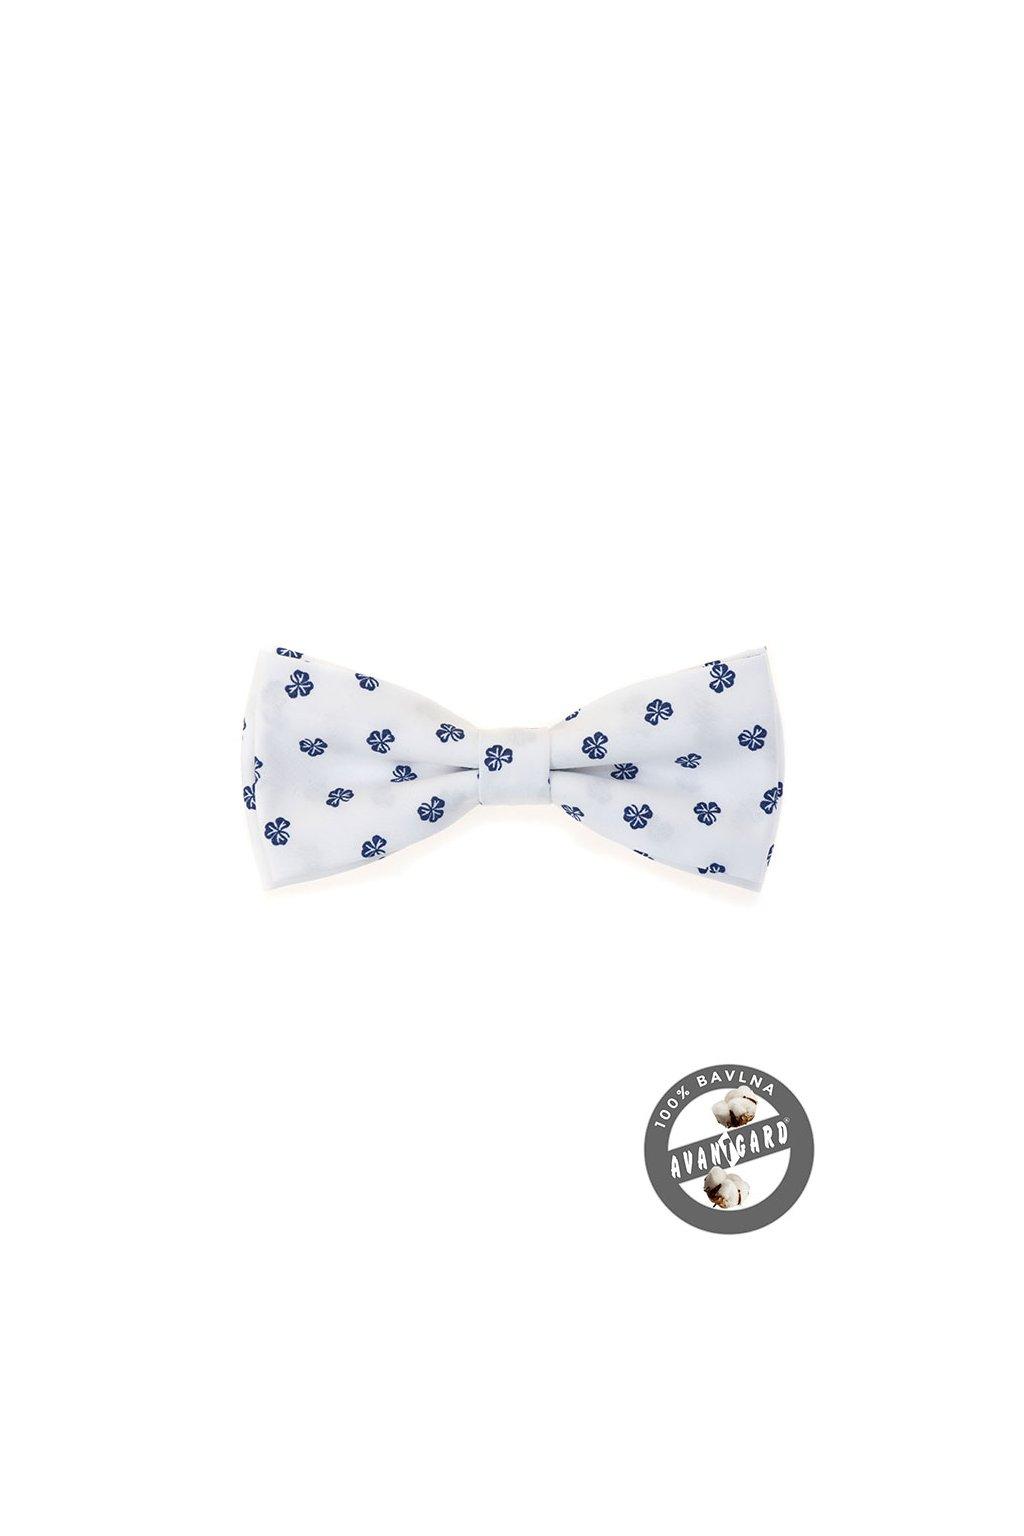 Motýlek PREMIUM bavlněný , 600-5198, Bílá/modrá